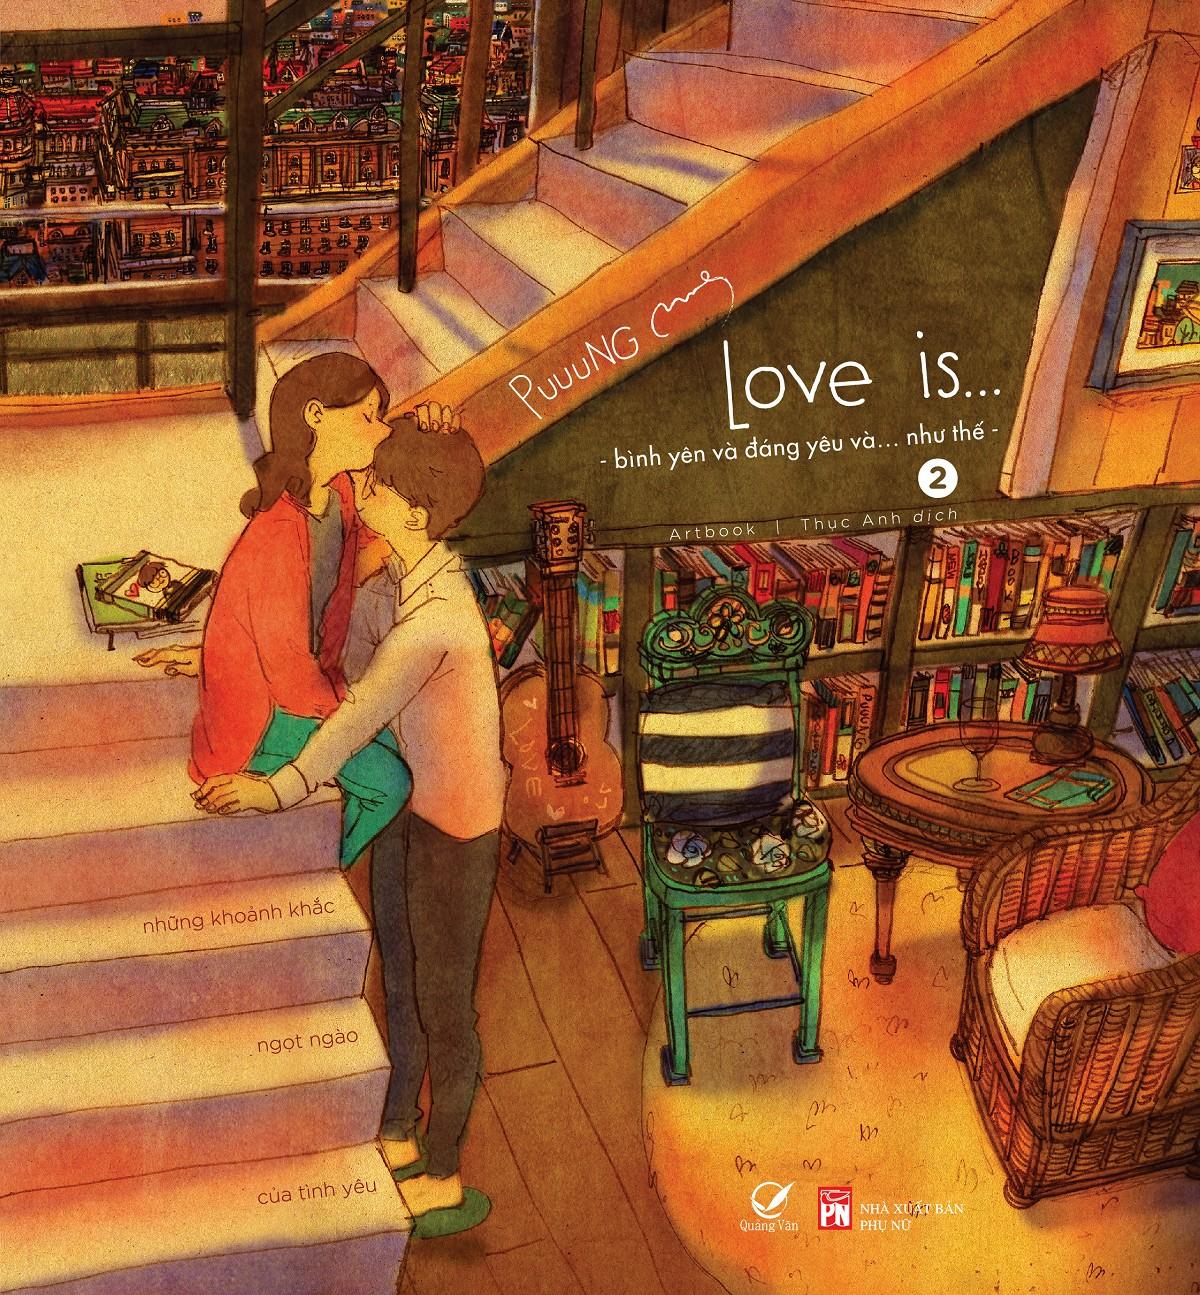 loveis2-cover.u84.d20170214.t100907.987027.jpg